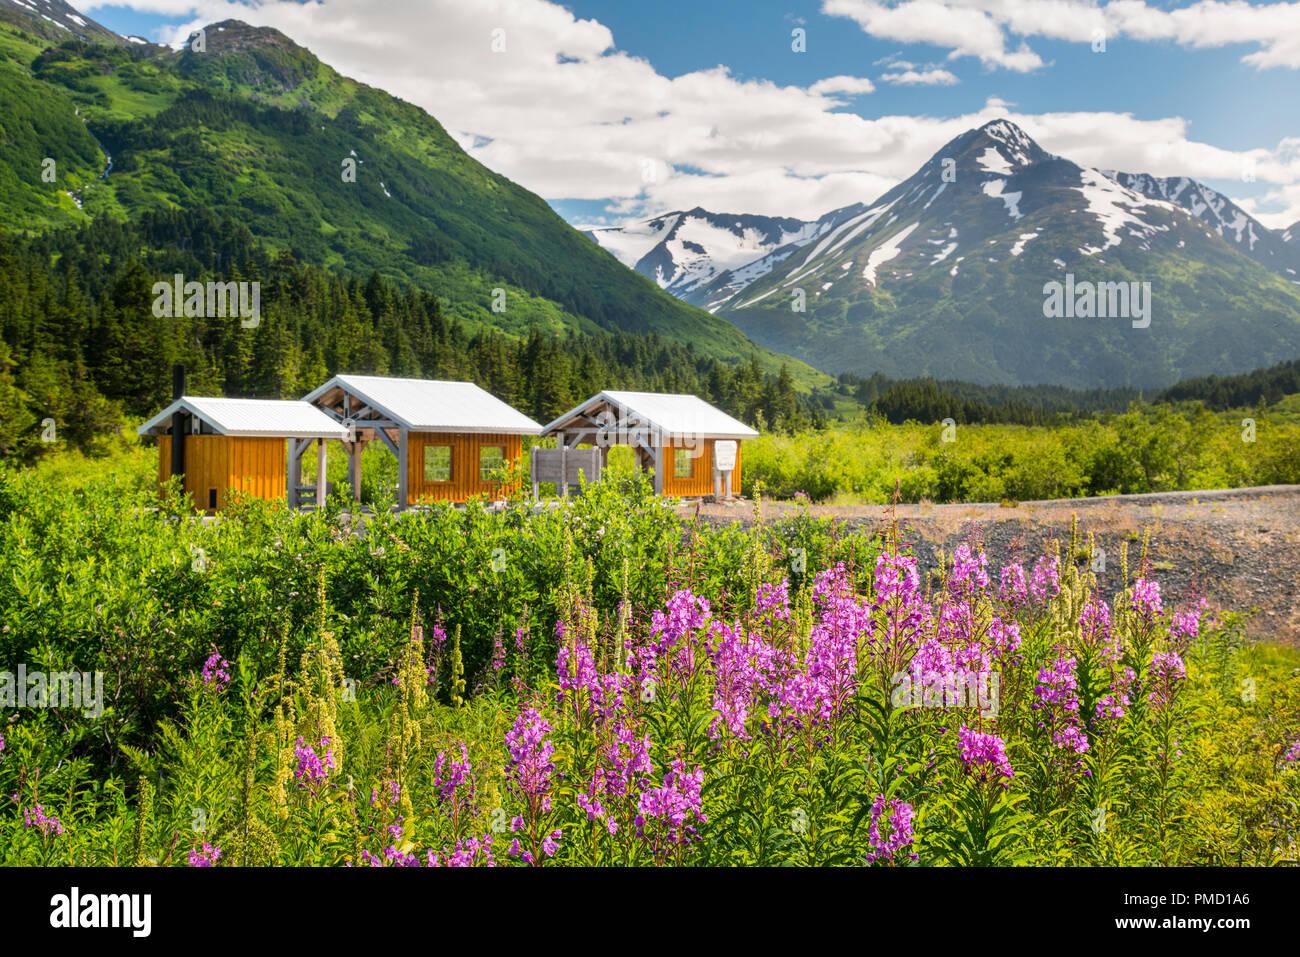 Alaska Railroad Glacier Discovery train trip,  Chugach National Forest, Alaska. - Stock Image